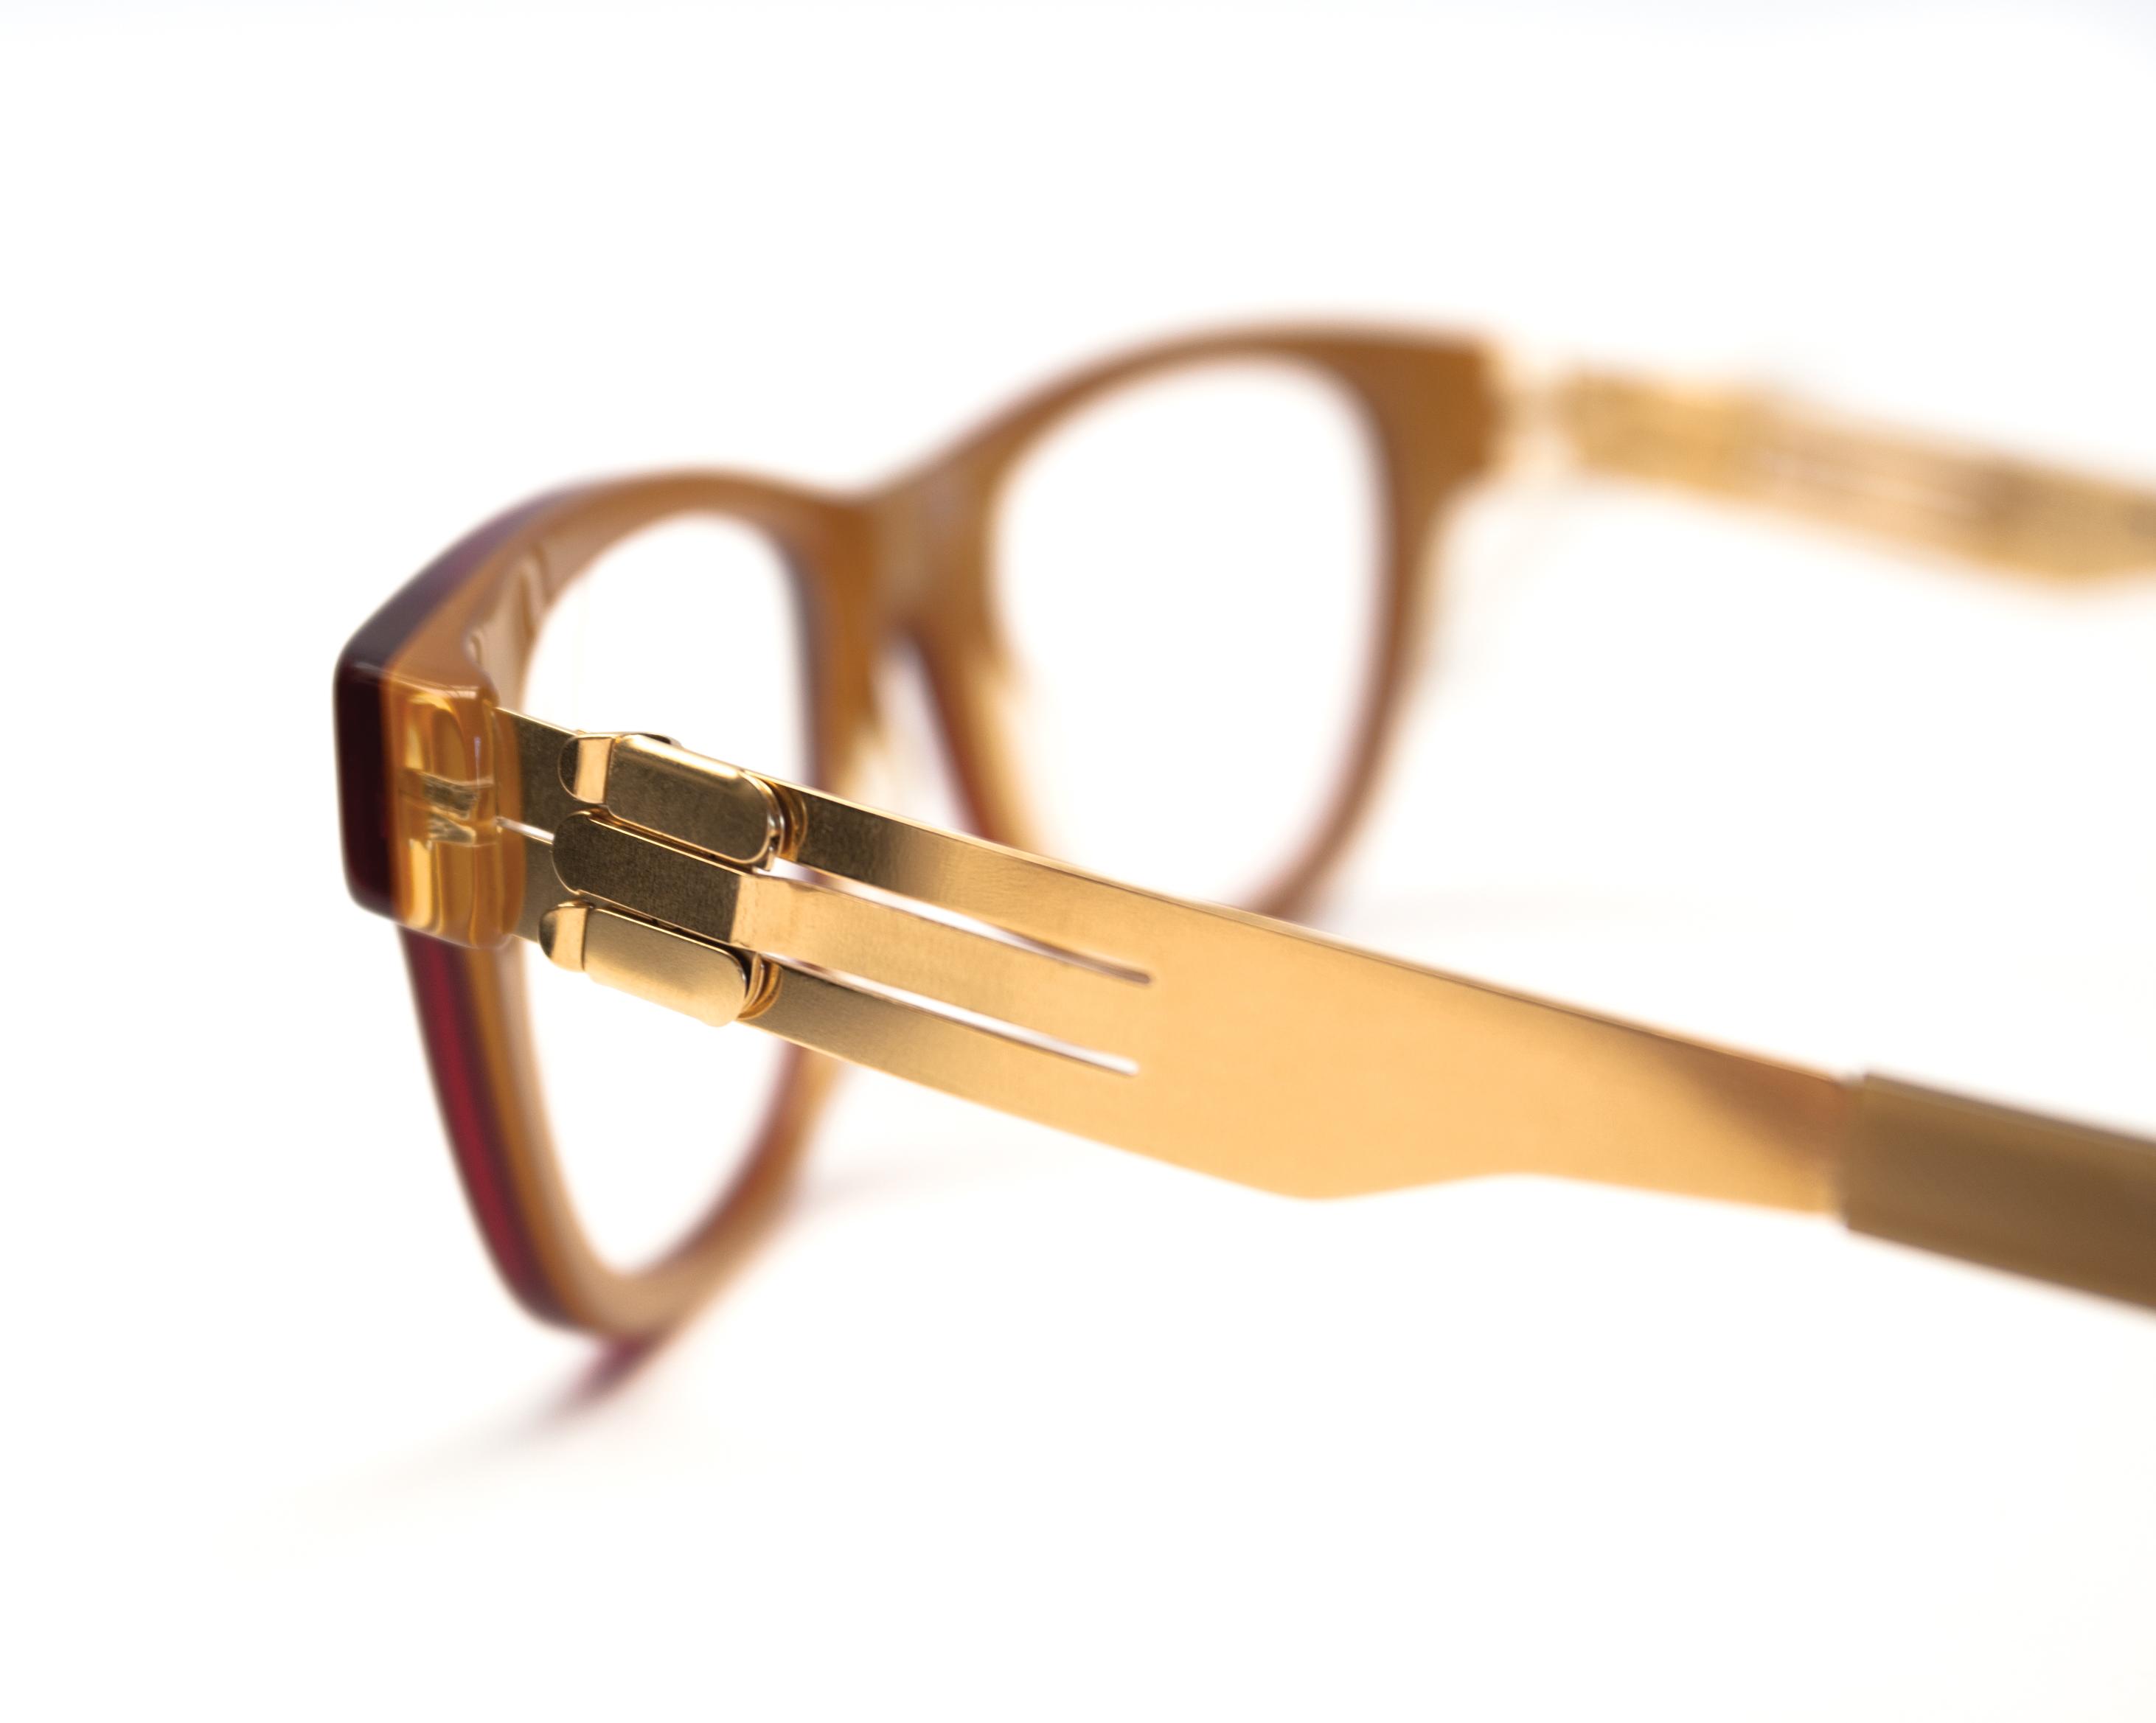 Eyeglass Frames Shape Memory Alloy : File:Ic berlin hinge-clauda s.jpg - Wikimedia Commons